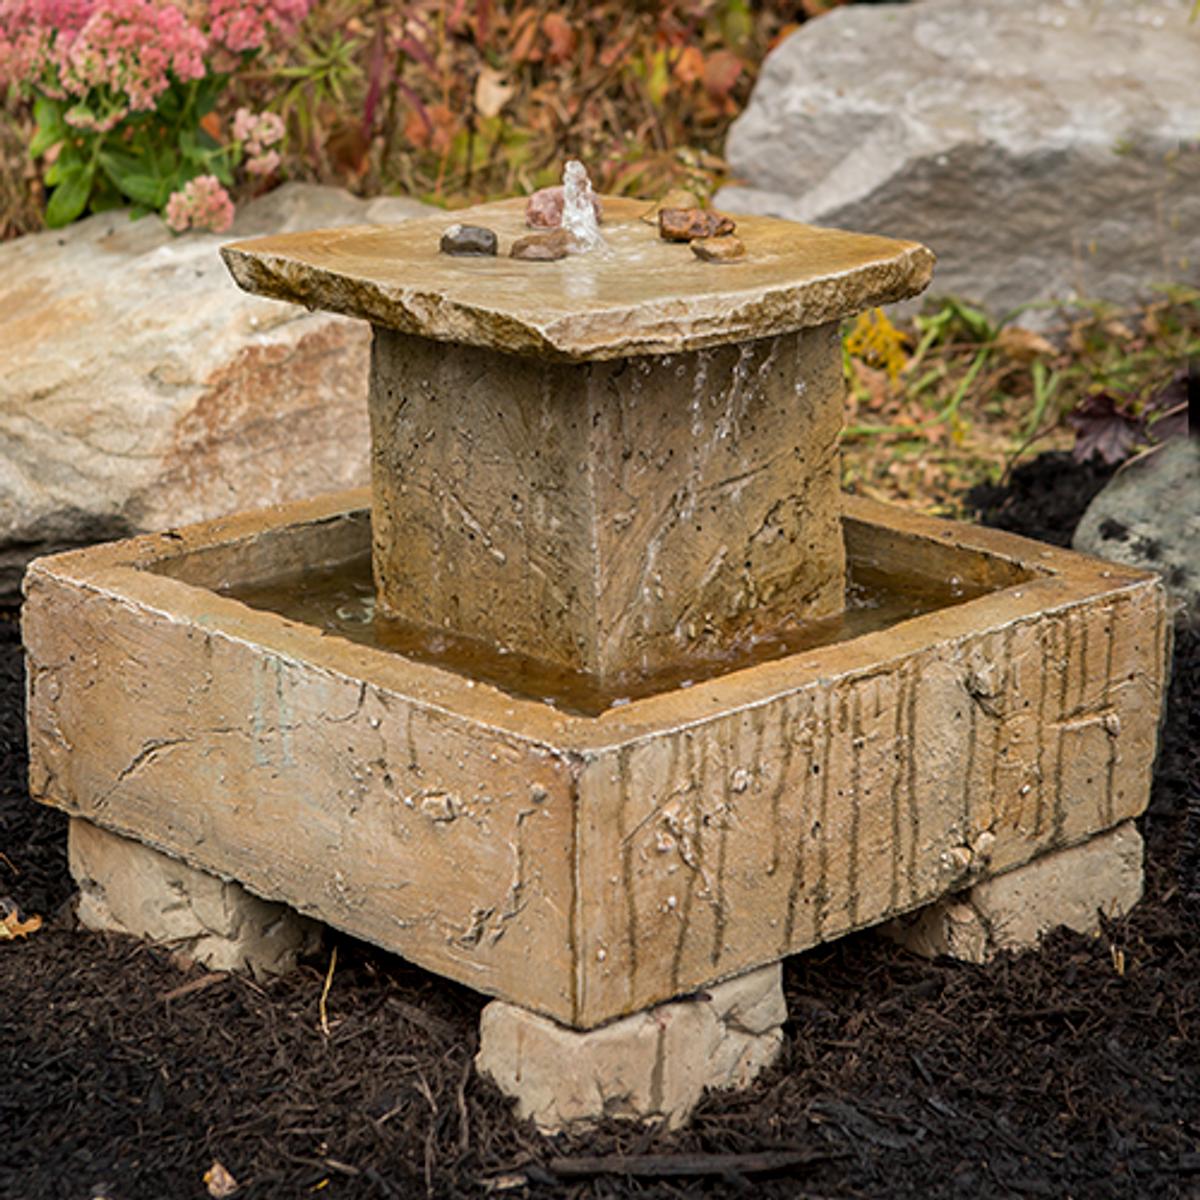 cast stone fountain, cement fountain, Small Cascade Fountain, Garden Fountain, Rock Fountain, Concrete fountain